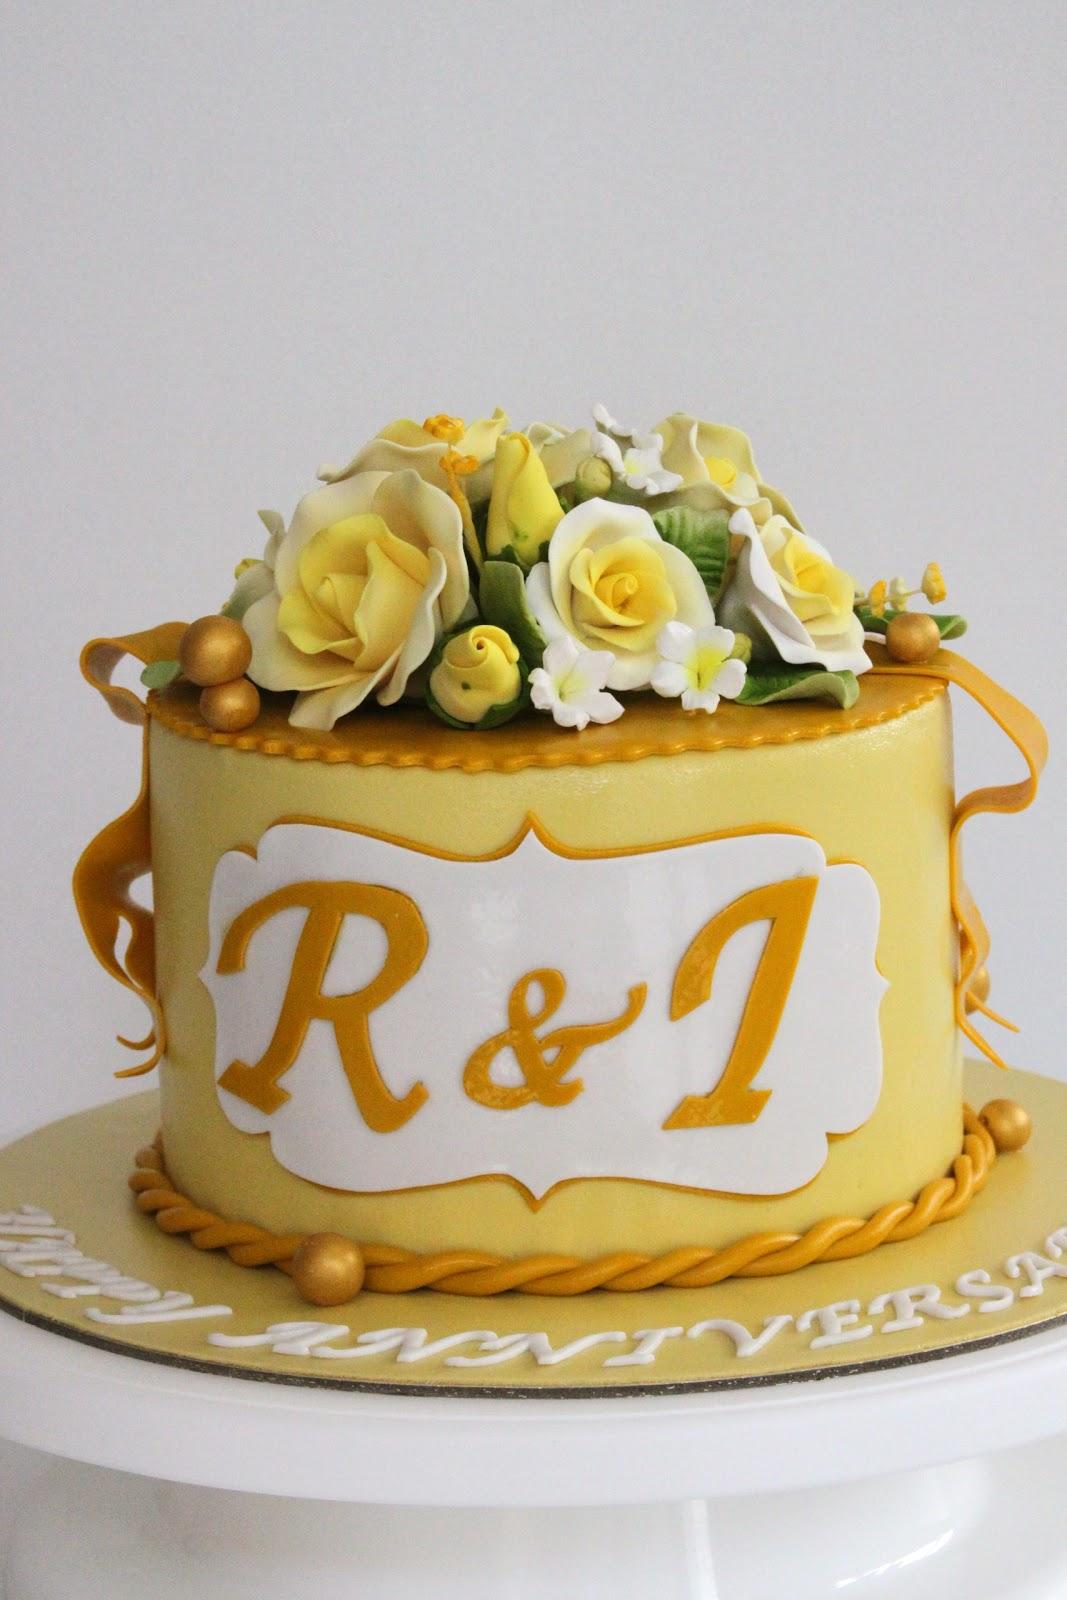 Celebrate with Cake!: Anniversary Cake